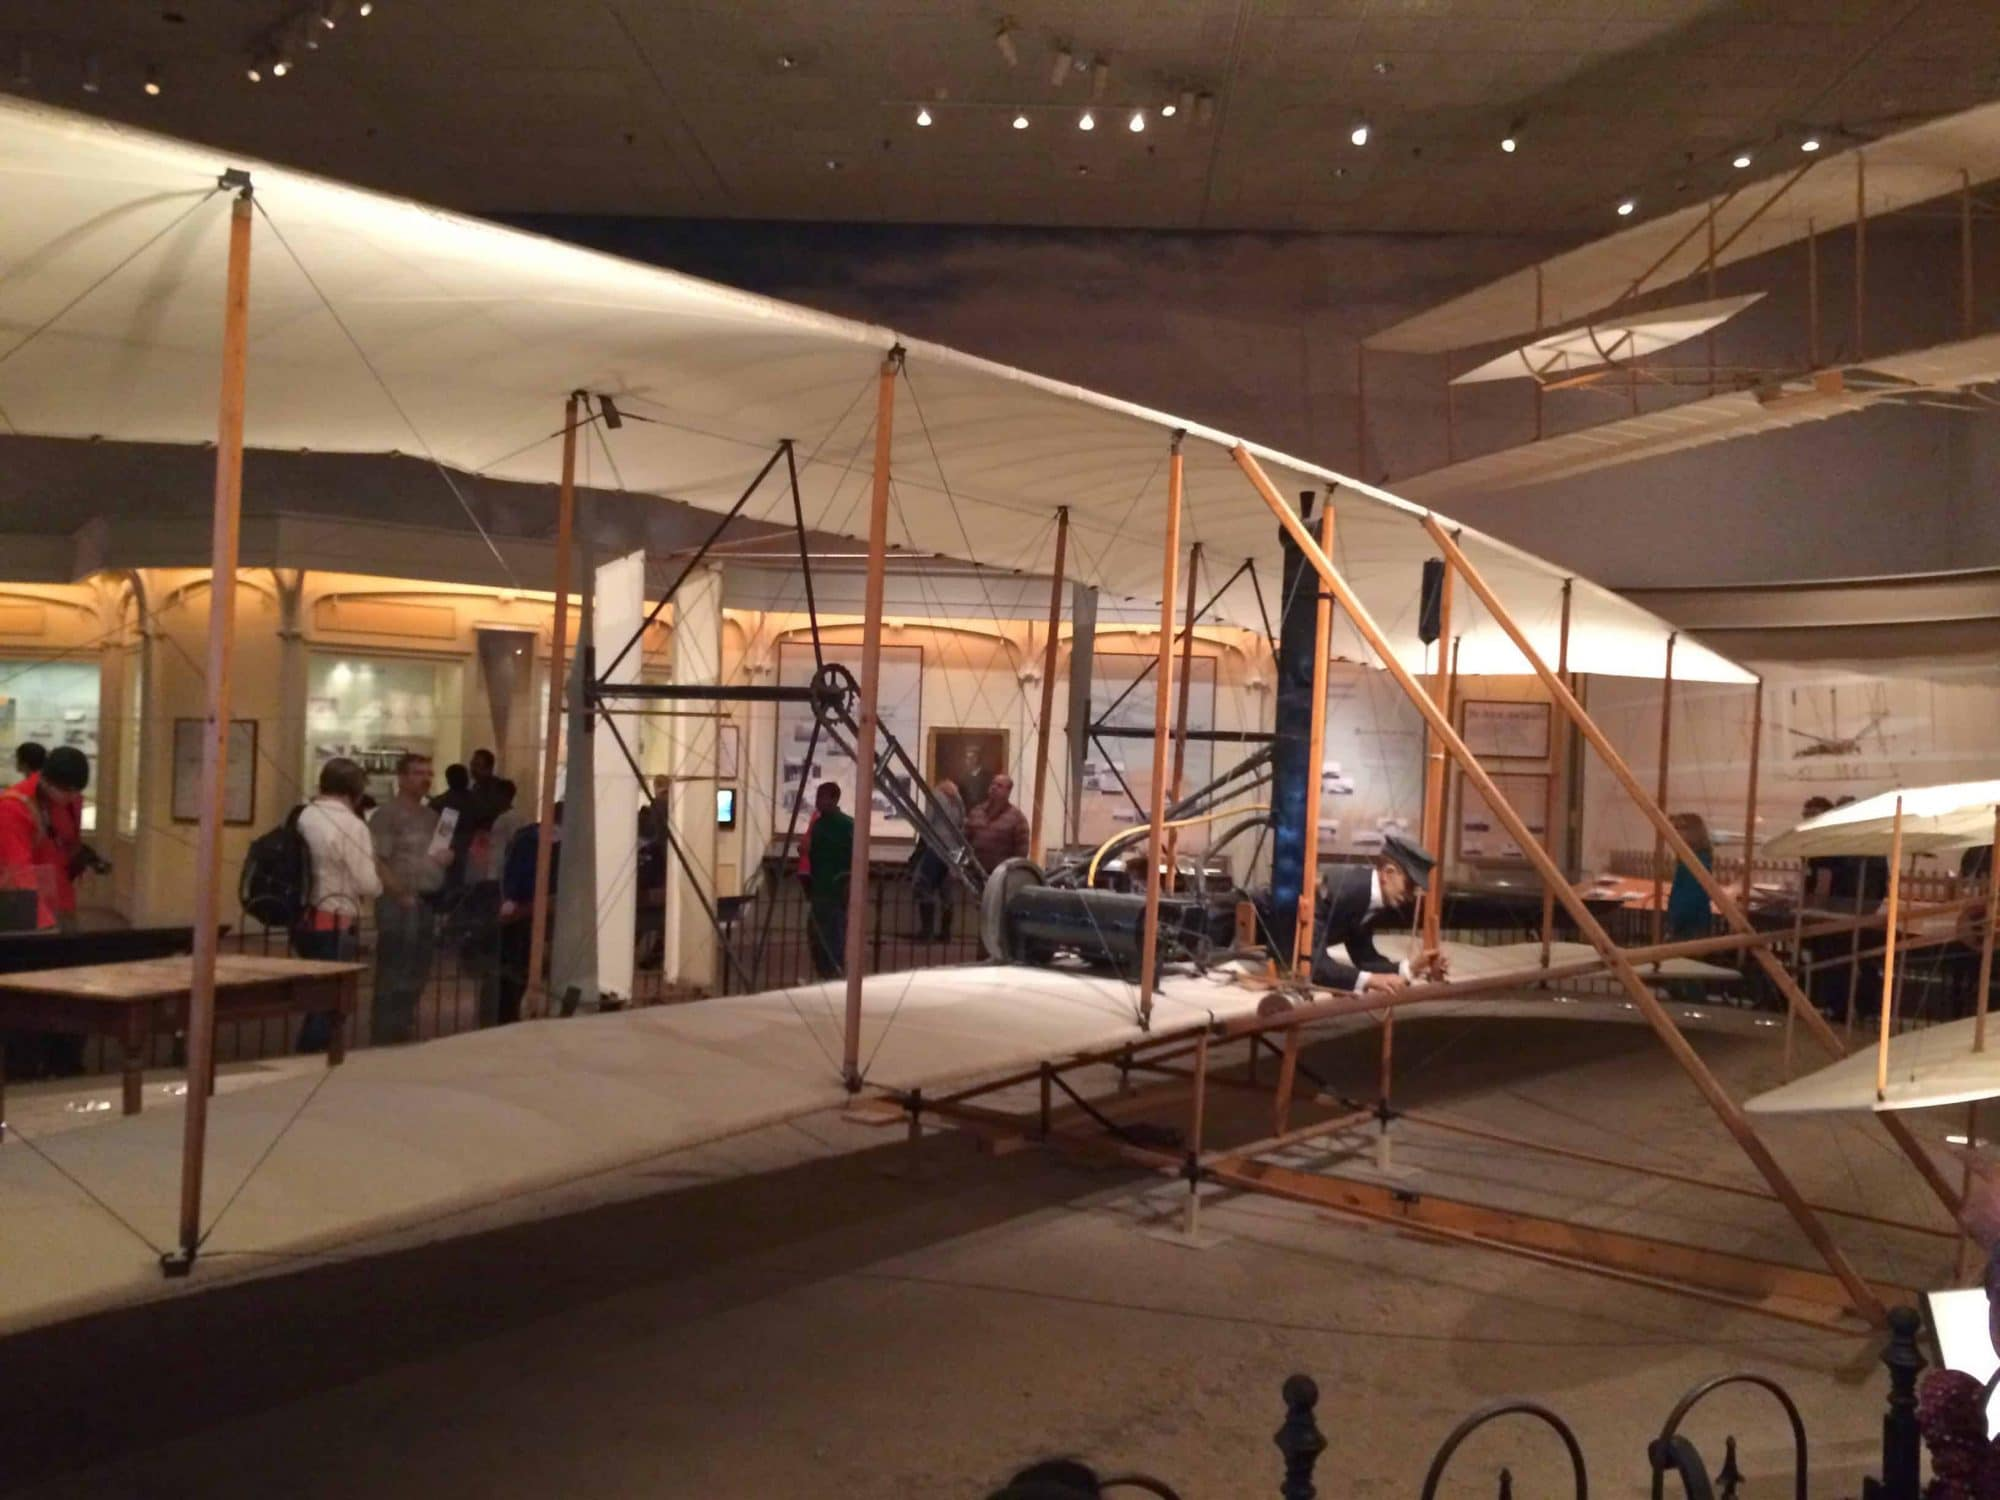 The original Wright Flyer